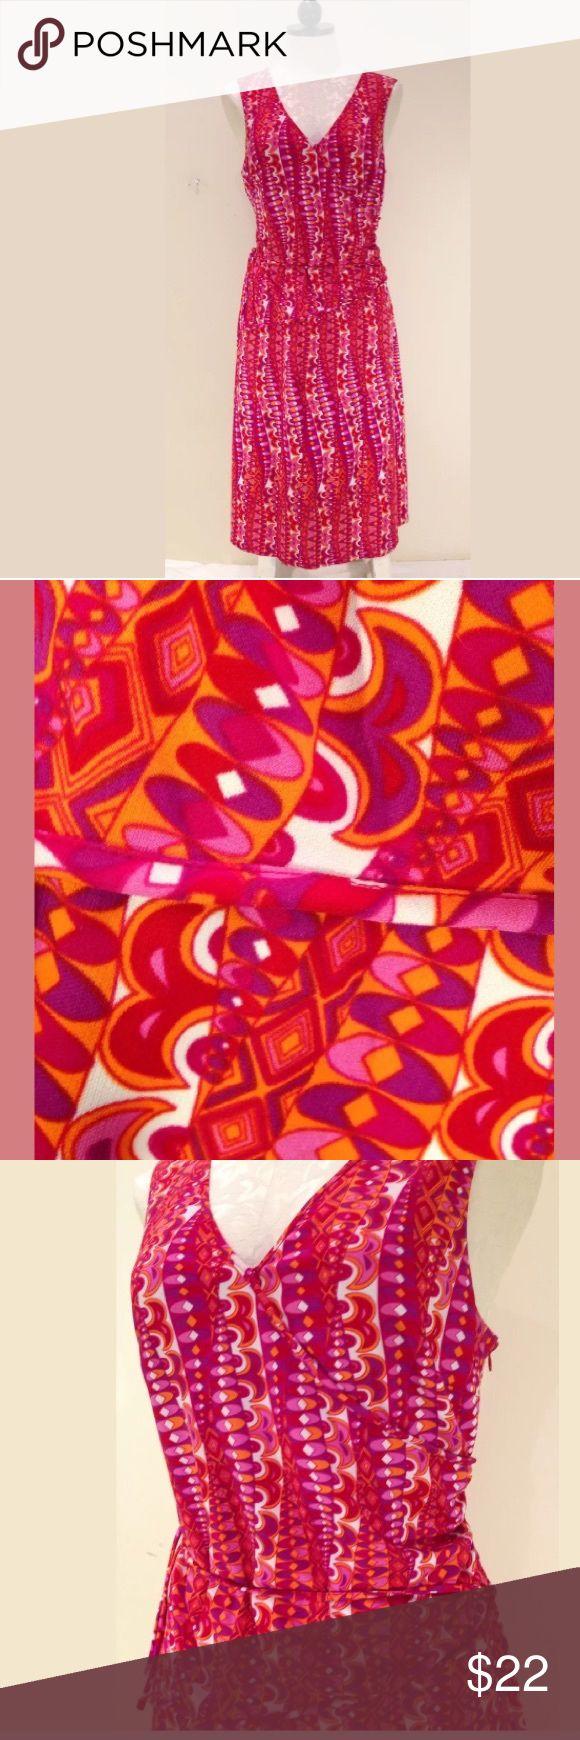 LAUNDRY SHELLI SEGAL Retro mod print V Neck dress LAUNDRY BY SHELLI SEGAL Pink, Orange Red Retro mod FLORAL print V Neck DRESS SZ 8 Beautiful v neck cocktail dress ! Laundry by Shelli Segal Dresses High Low